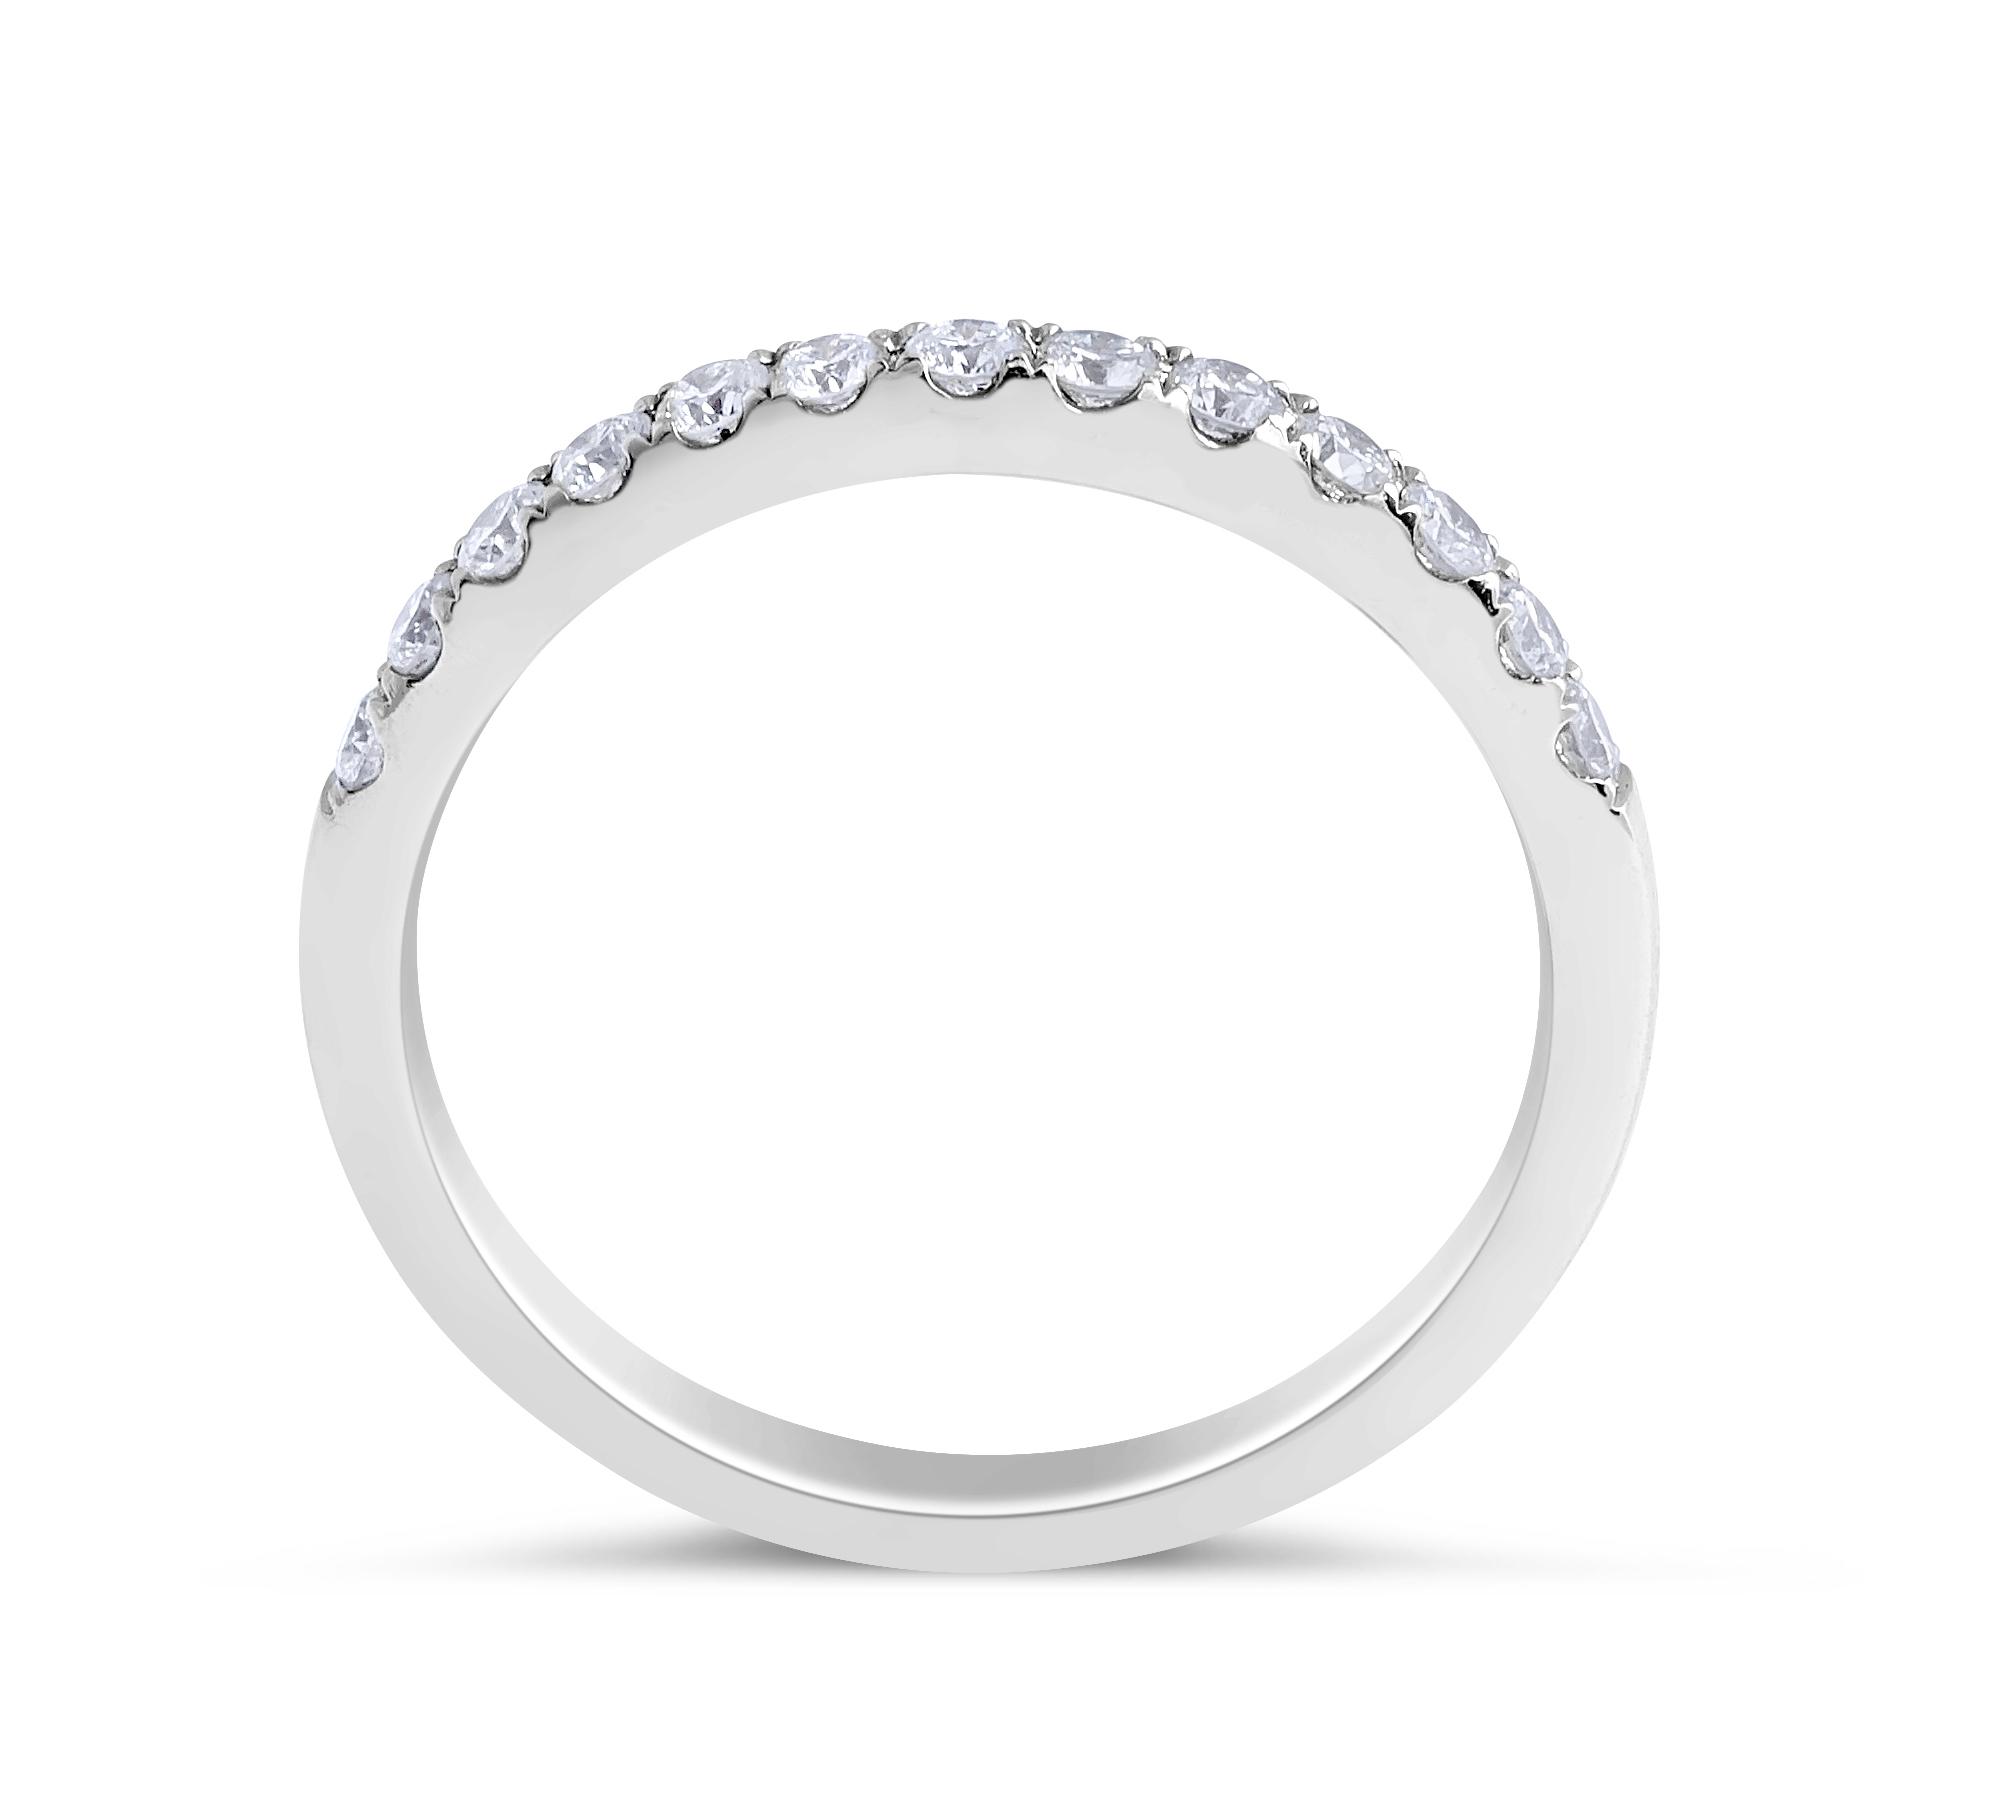 18 Karat White Gold Classic Modern Style Diamond Wedding Band (Ladies Band Settings)